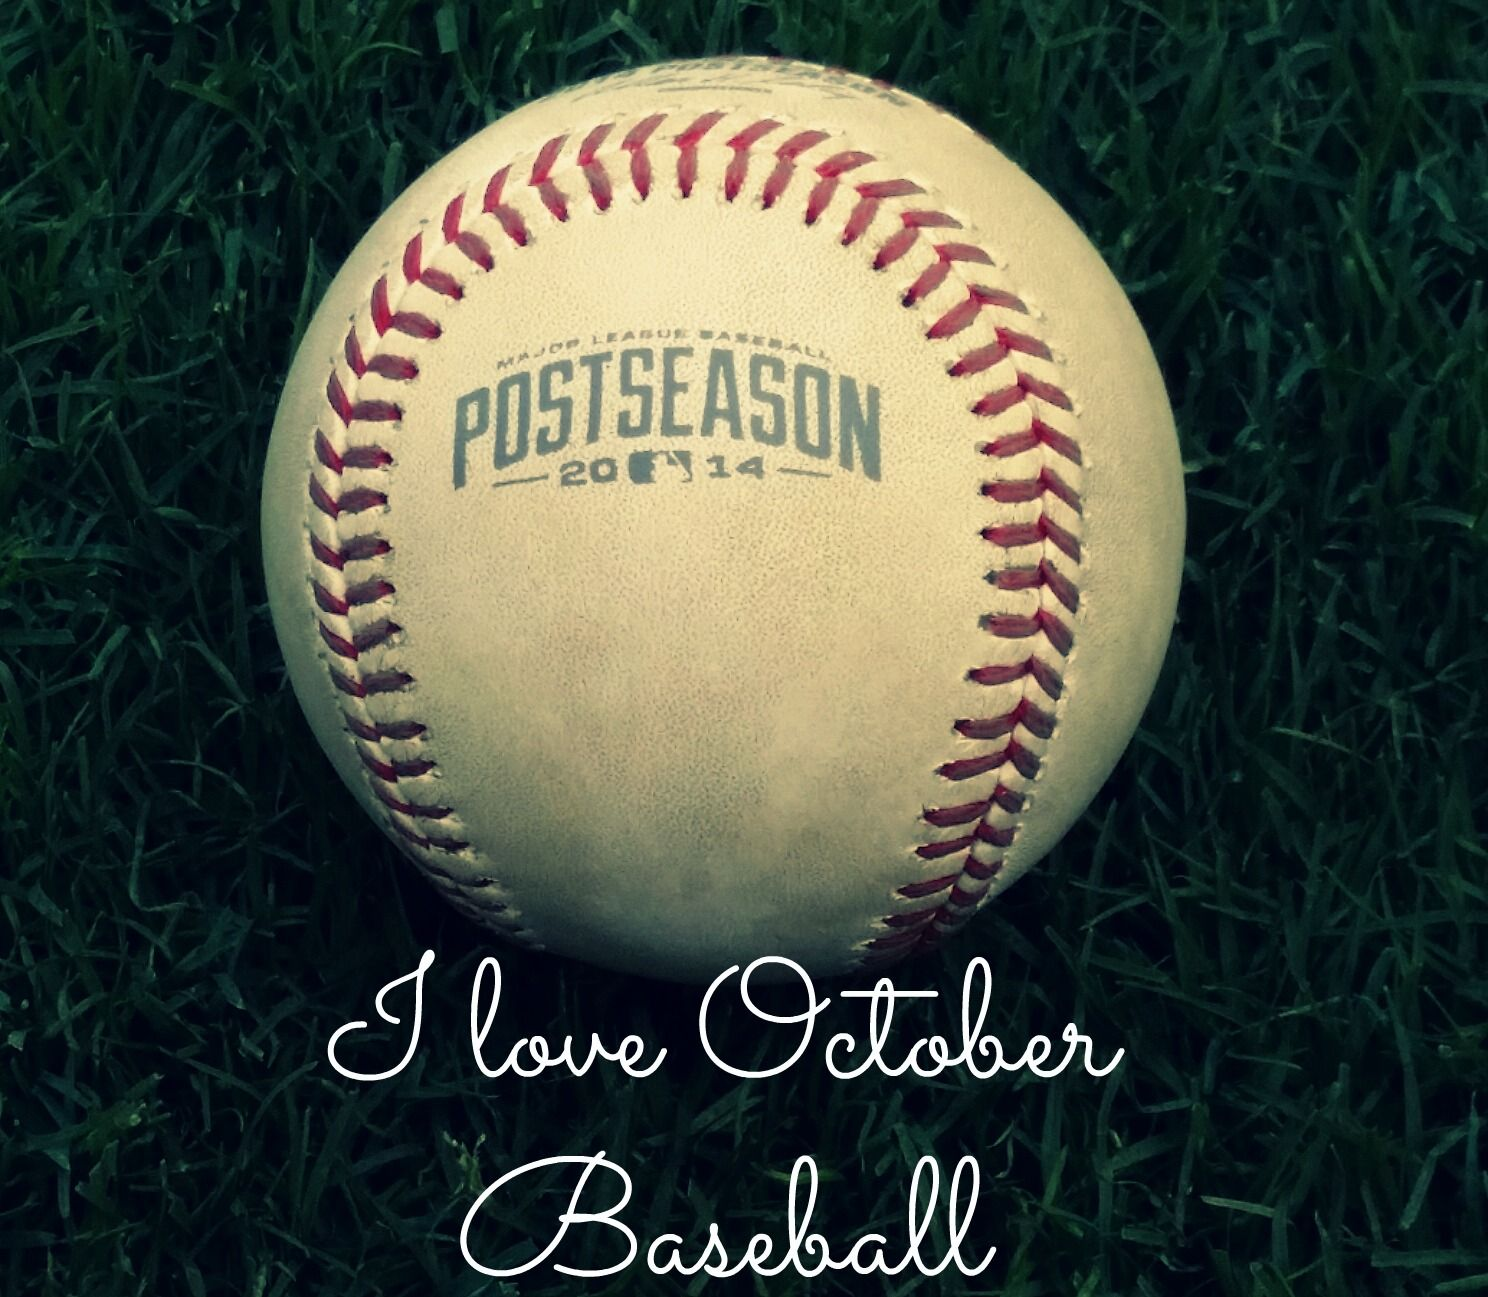 Repin if you love postseason baseball